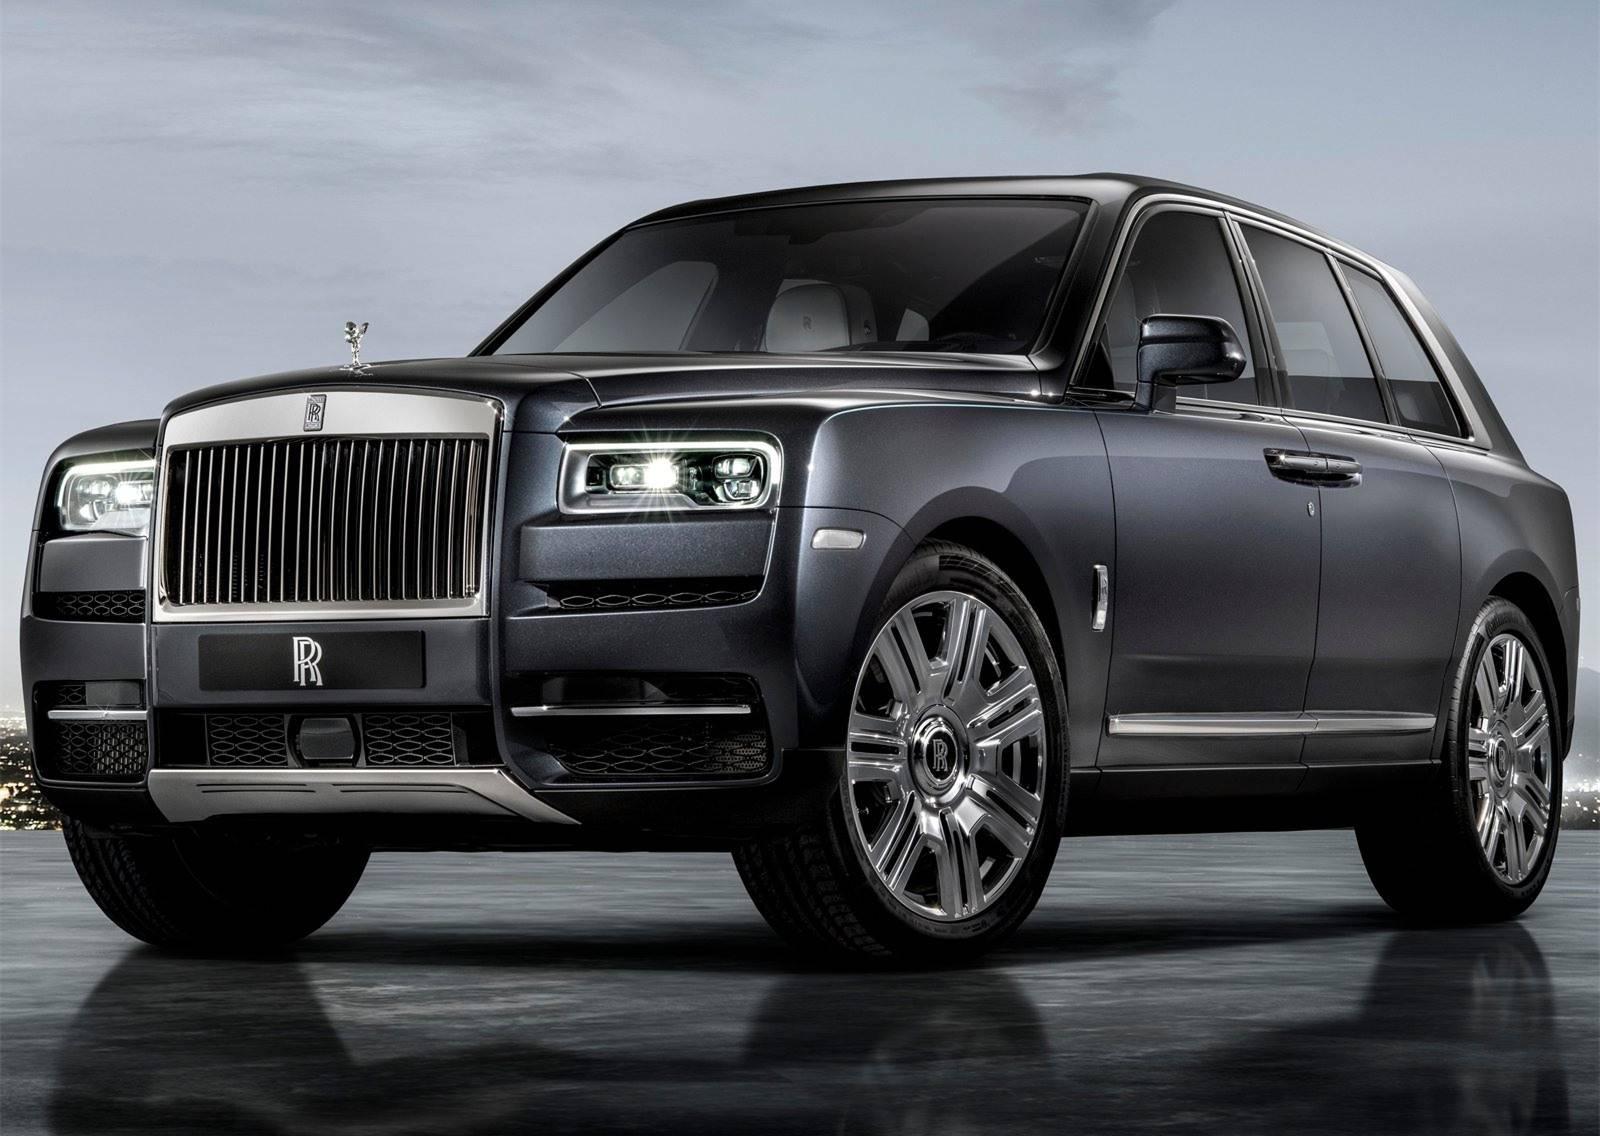 Rolls-Royce-Cullinan-2019-1600-03.jpg